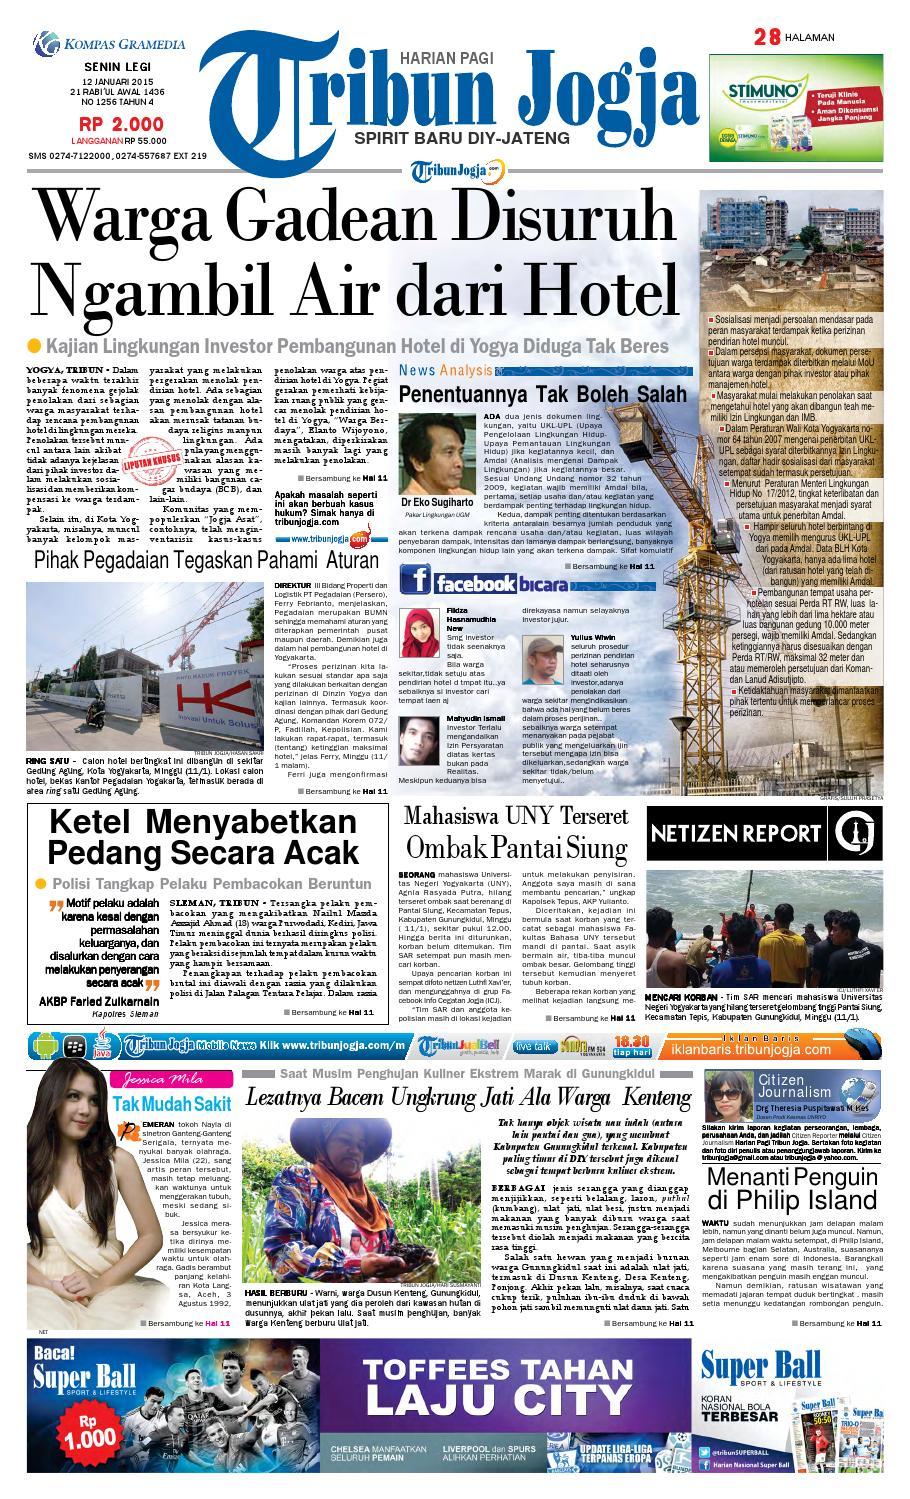 Tribunjogja 12 01 2015 By Tribun Jogja Issuu 95cm Nomor Tekstur Rumah Kantor Kamar Kost Hotel Kuningan No 1